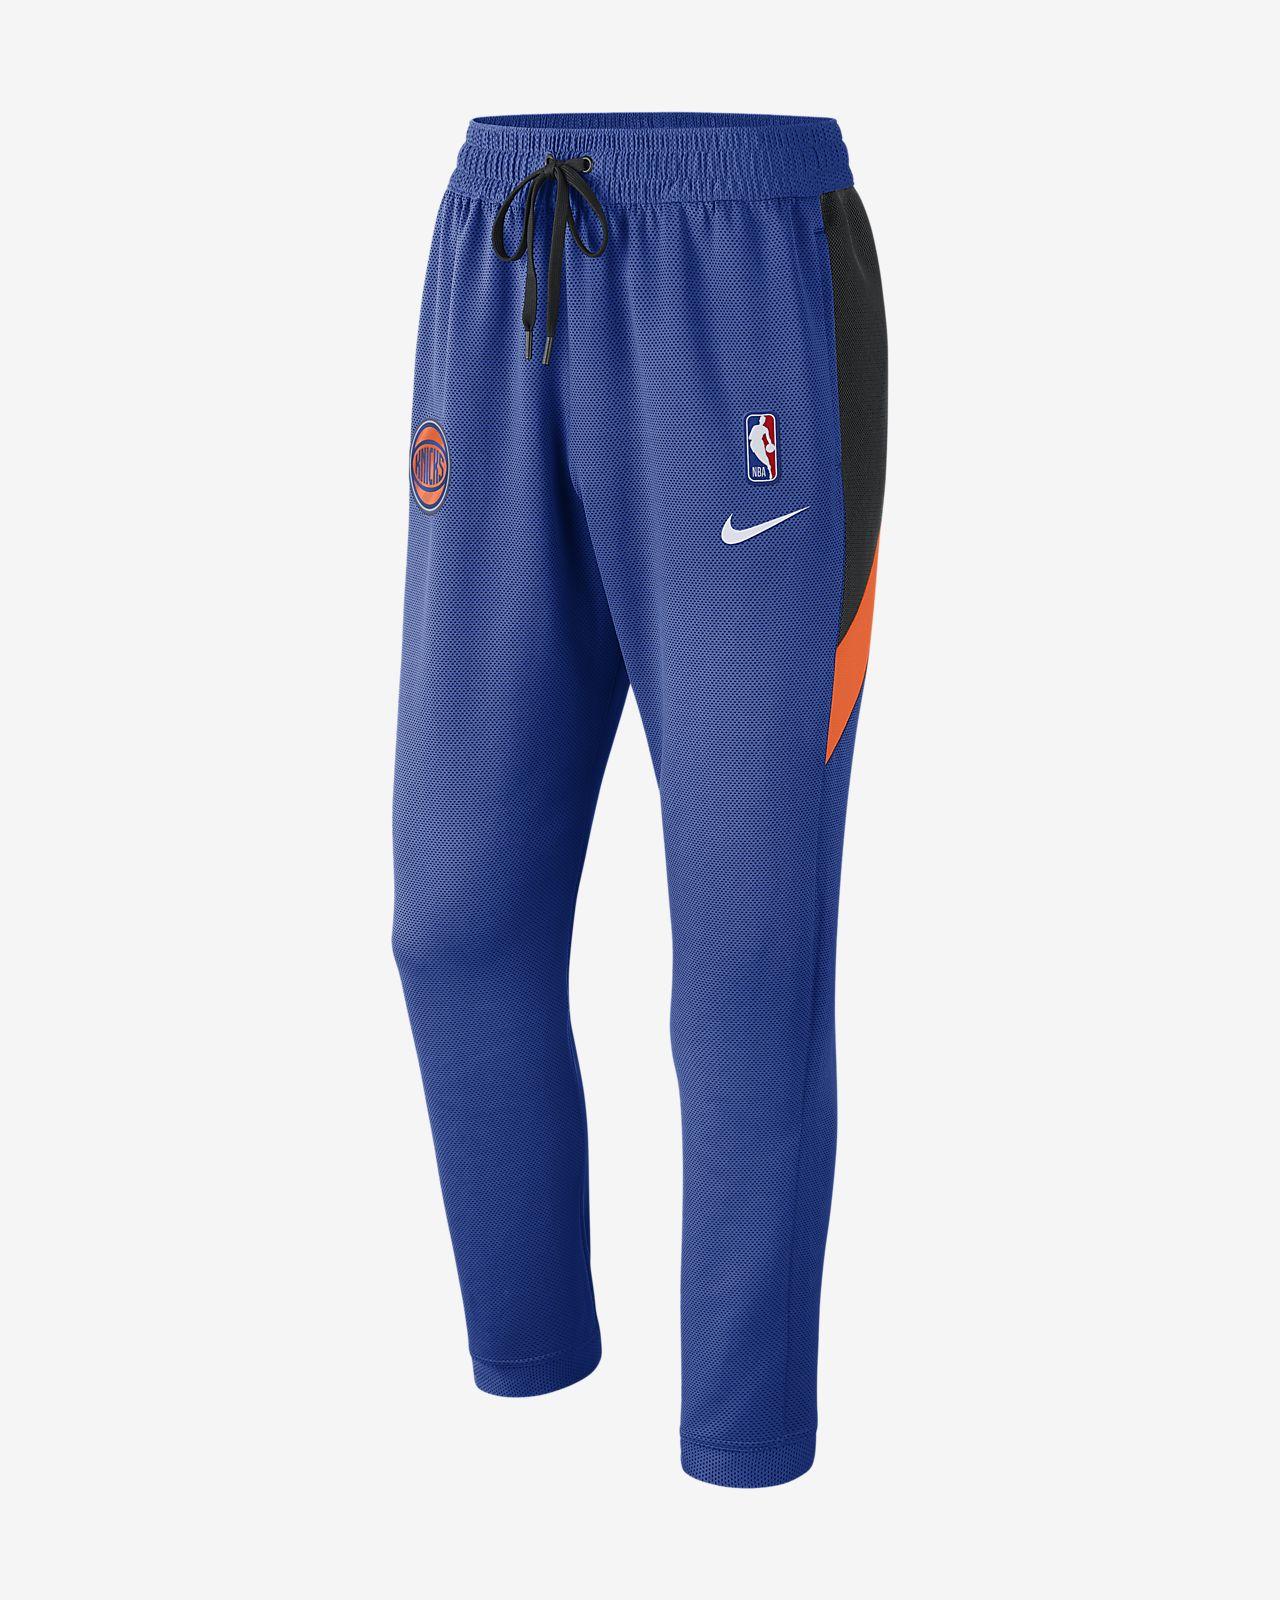 Pantalon NBA New York Knicks Nike Therma Flex Showtime pour Homme